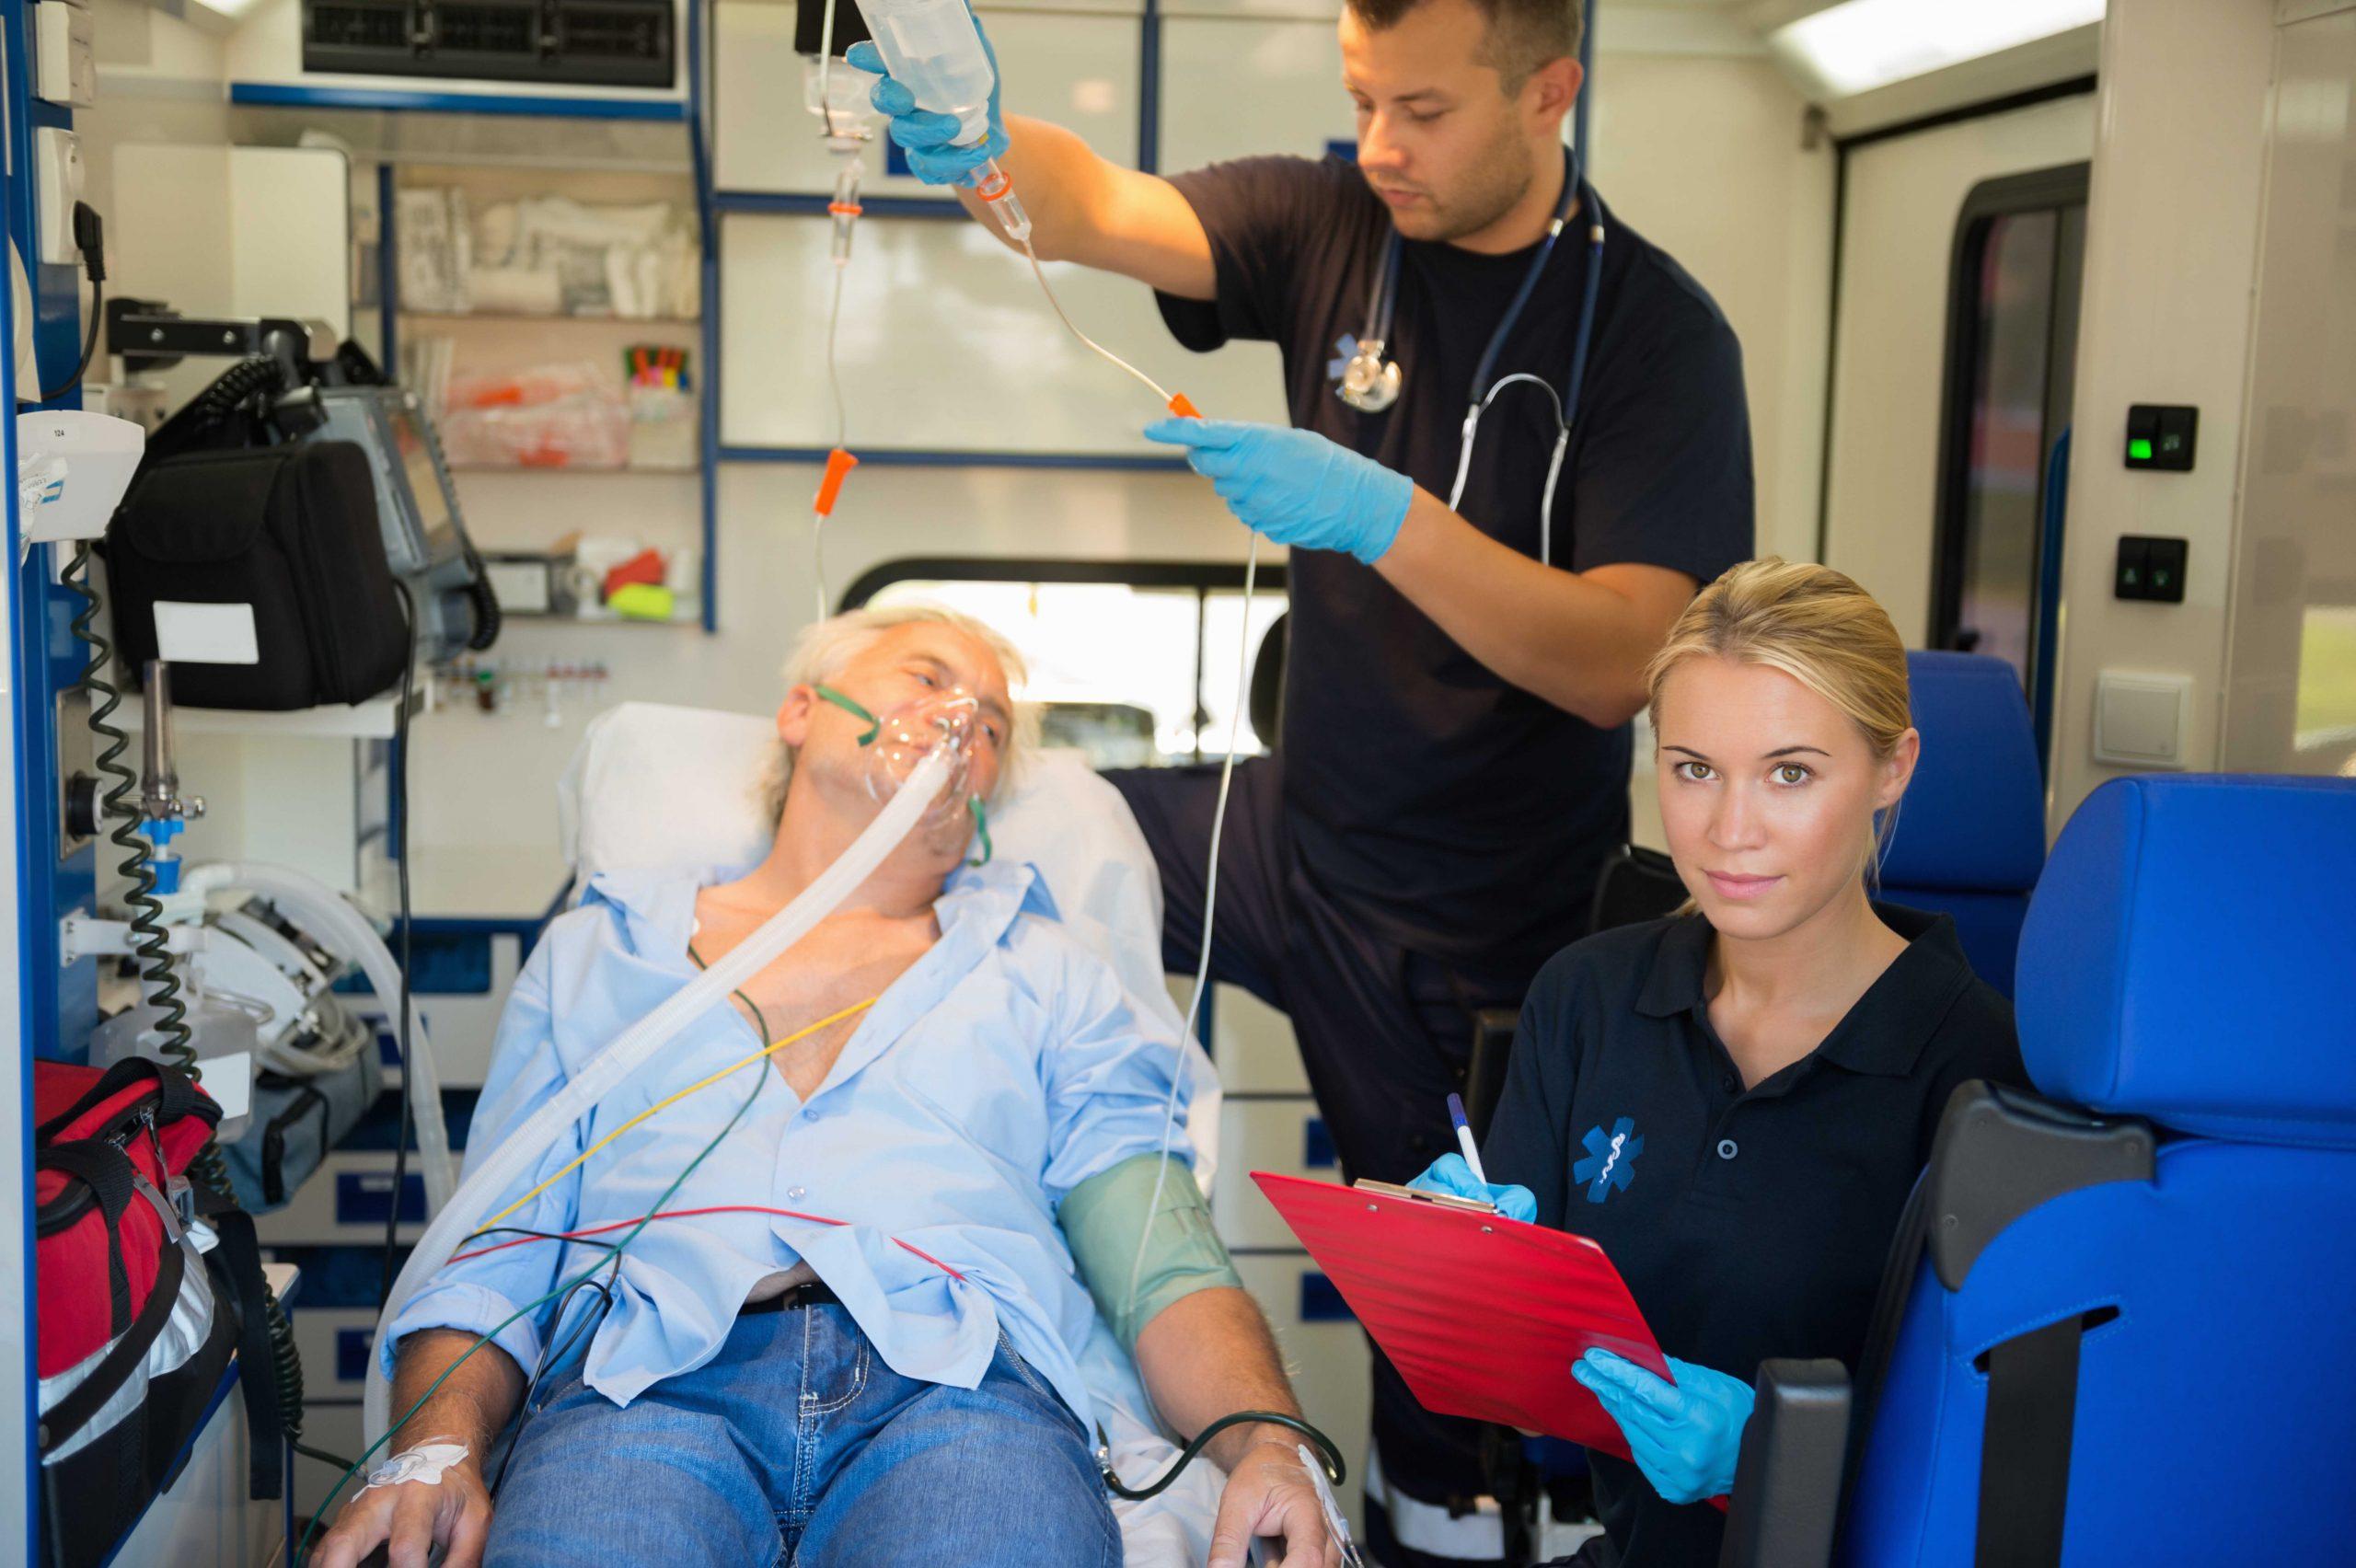 Ambulance USA ALS Patient Equipment 2 scaled